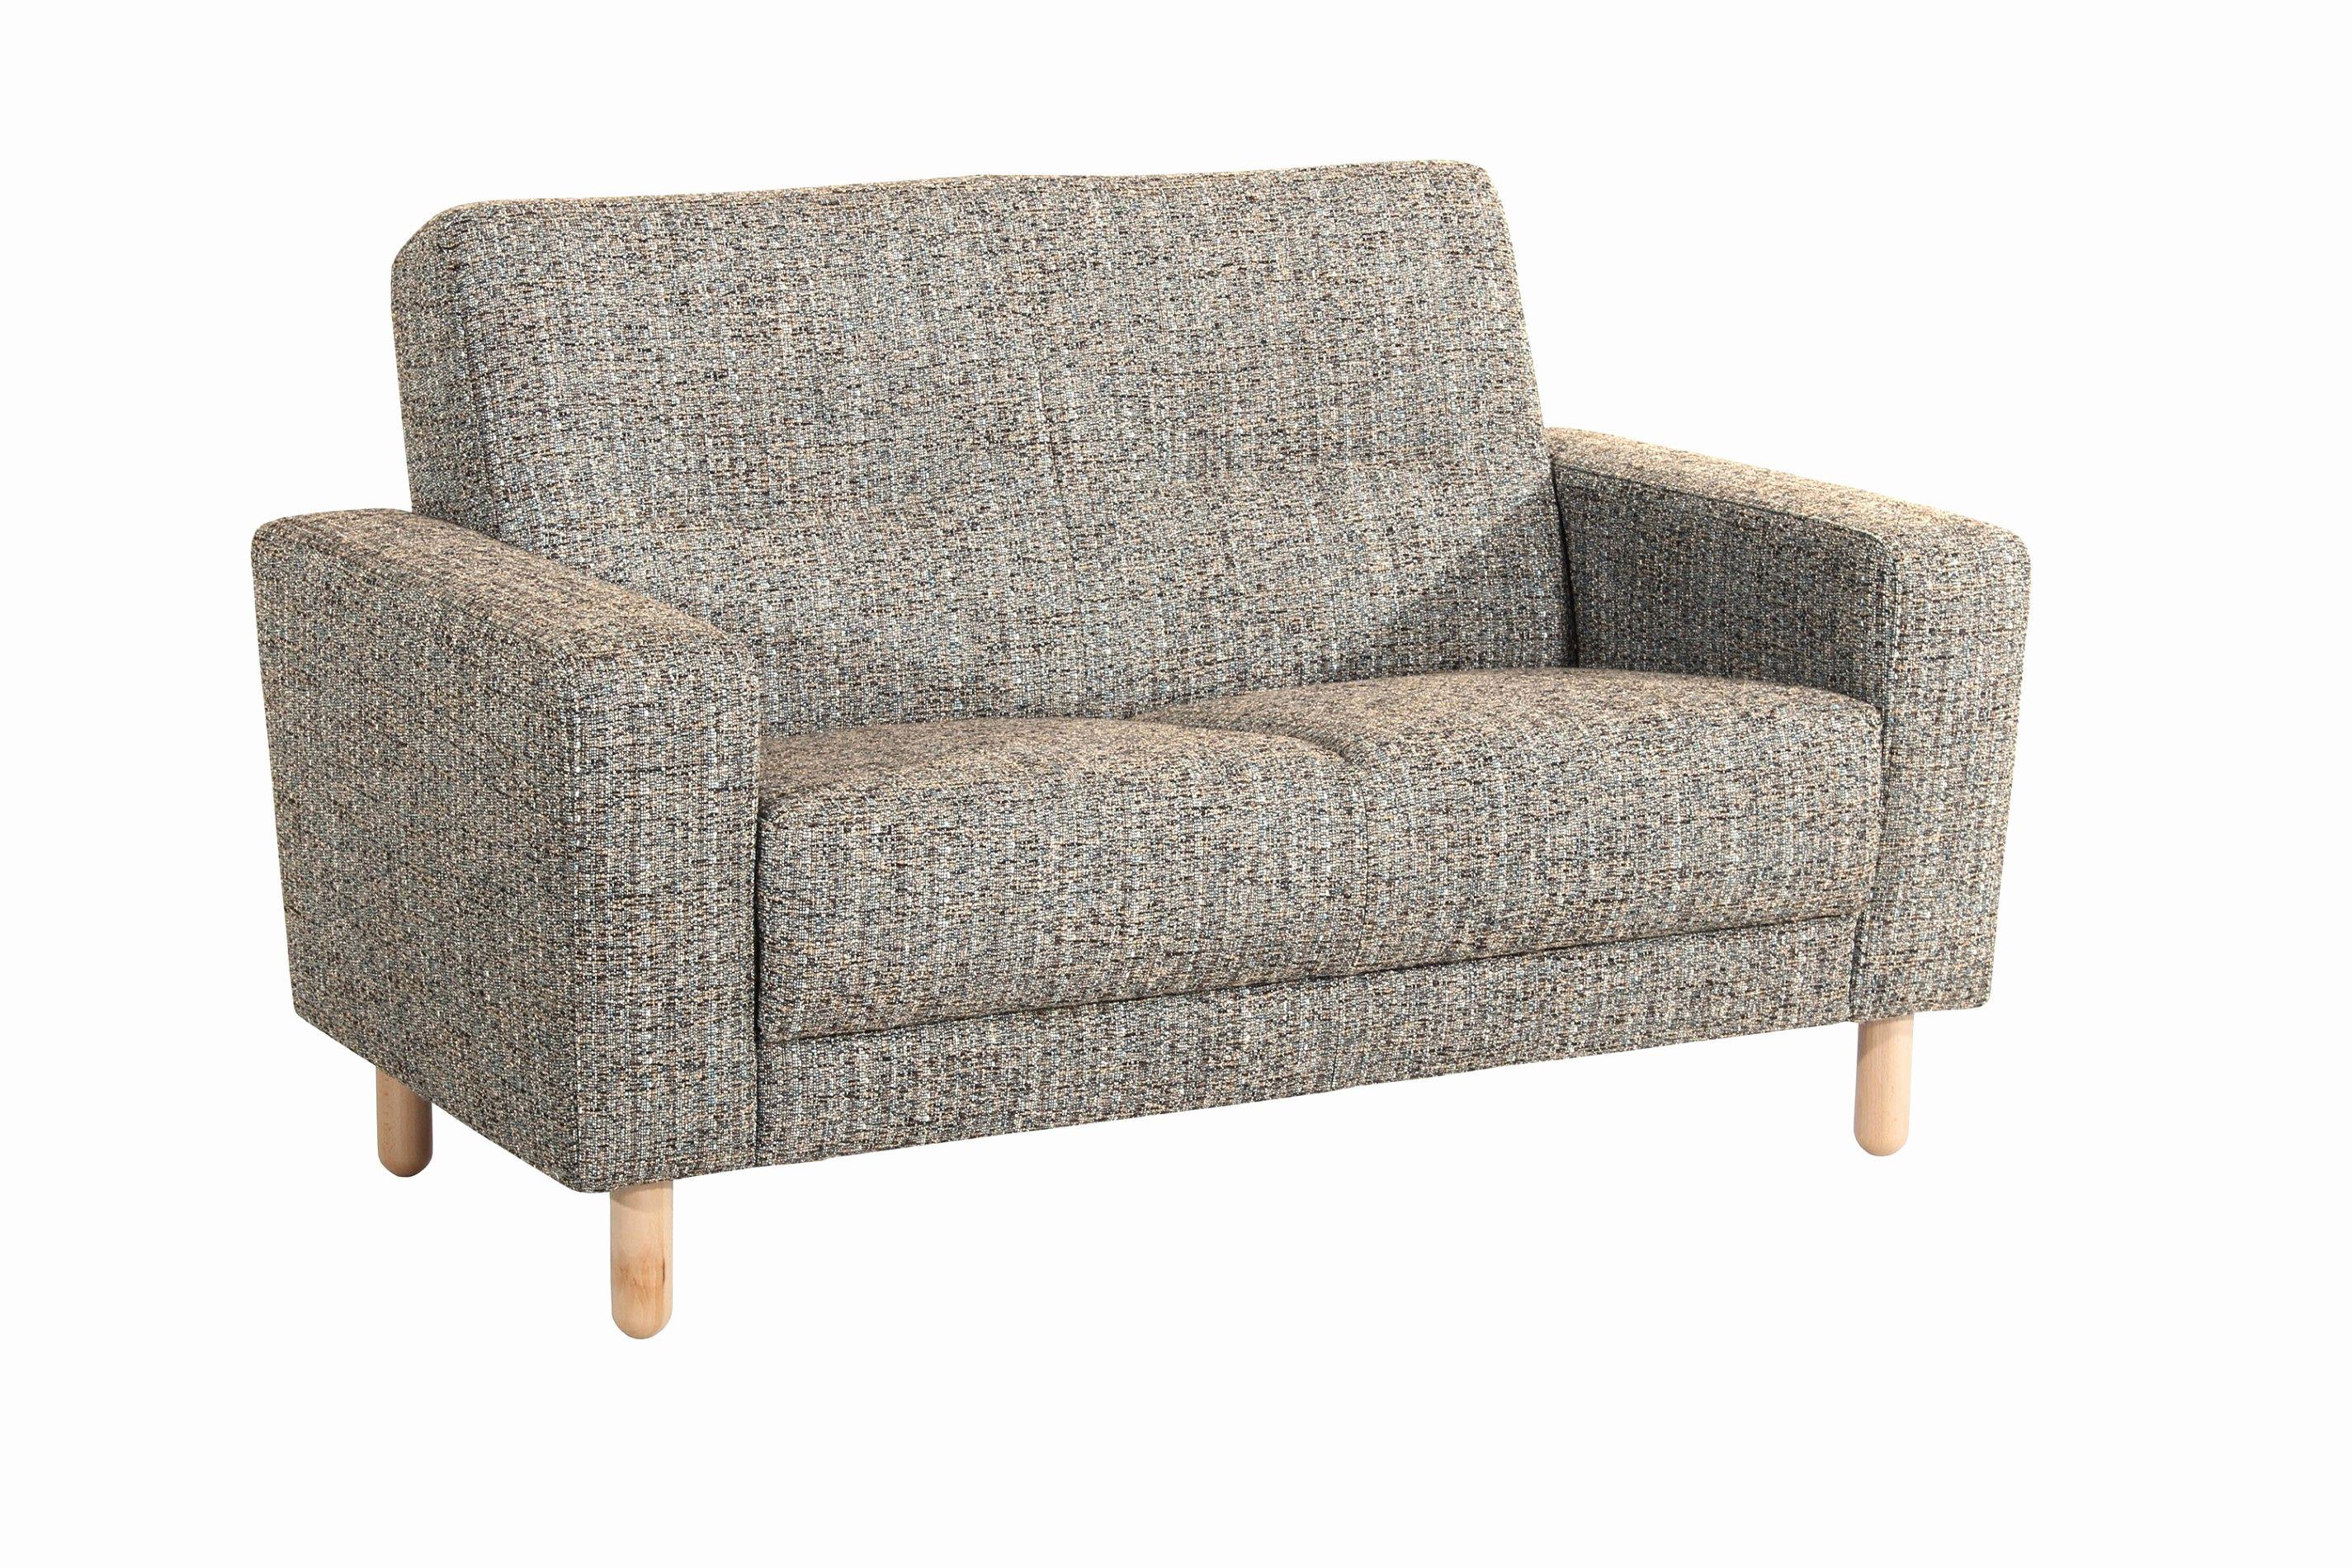 24 Elegante Intex Queen Sleeper Sofa Walmart Sofa kaufen